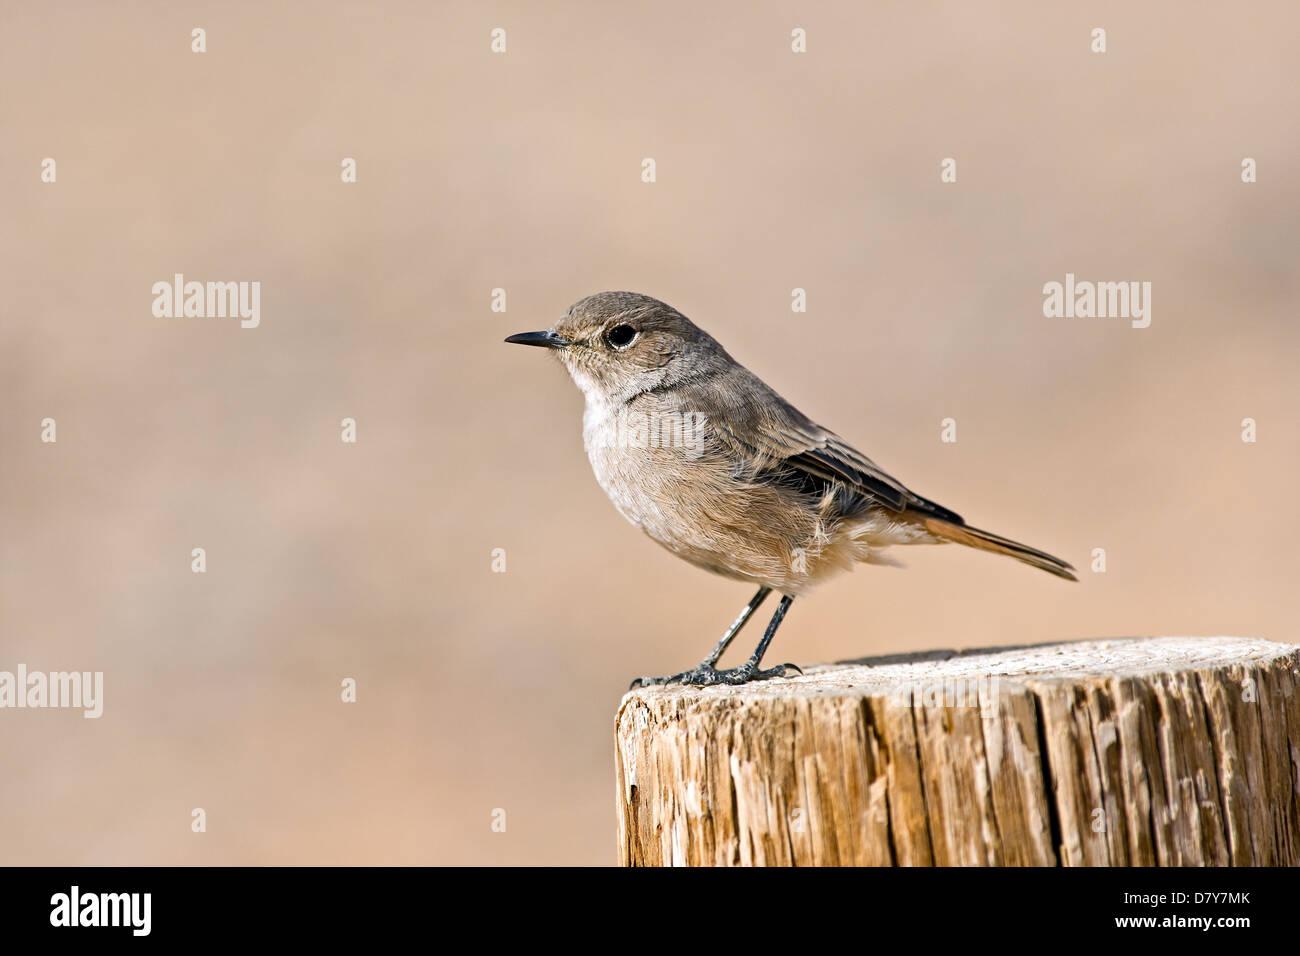 Mariqua flycatcher - Stock Image